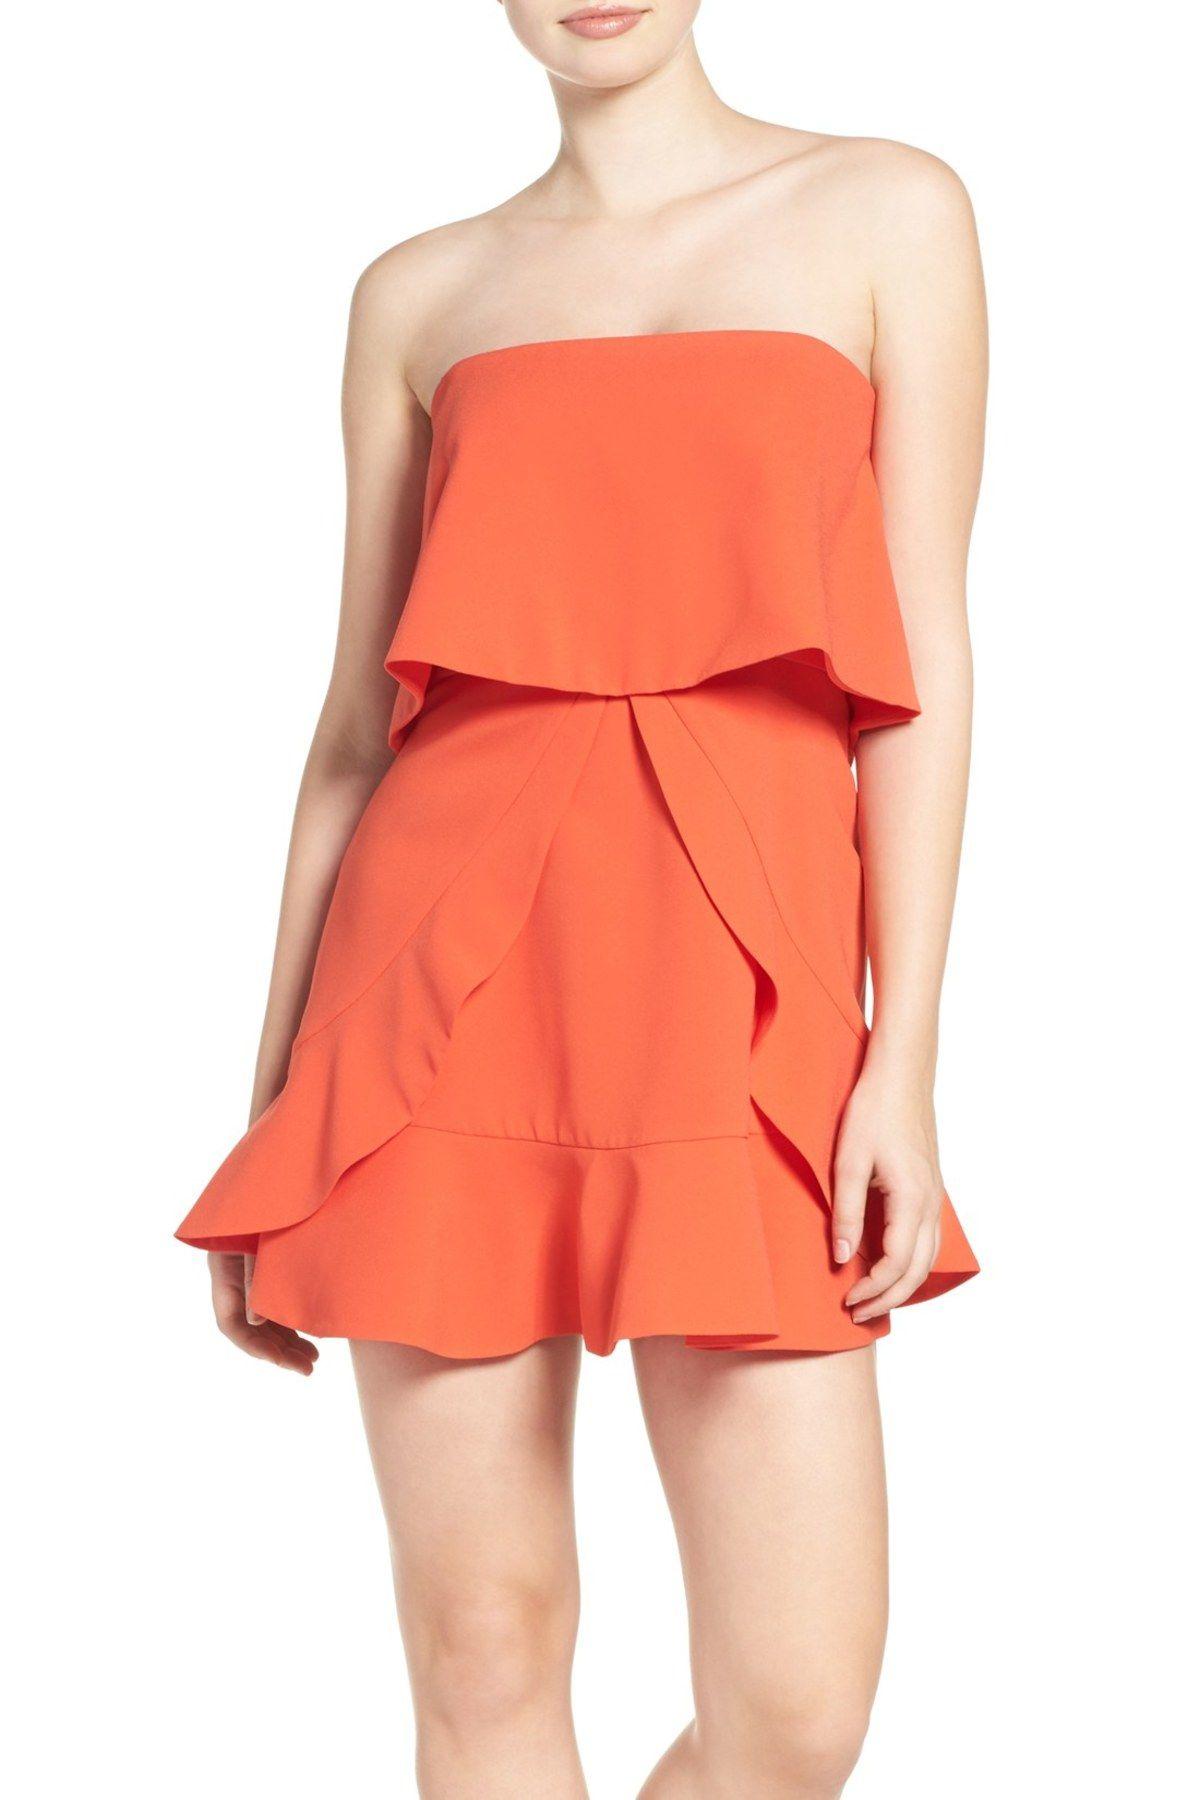 Charlot Strapless Ruffle Crepe Popover Dress Corset Style Dresses Fancy Dresses Frilly Dresses [ 1800 x 1200 Pixel ]